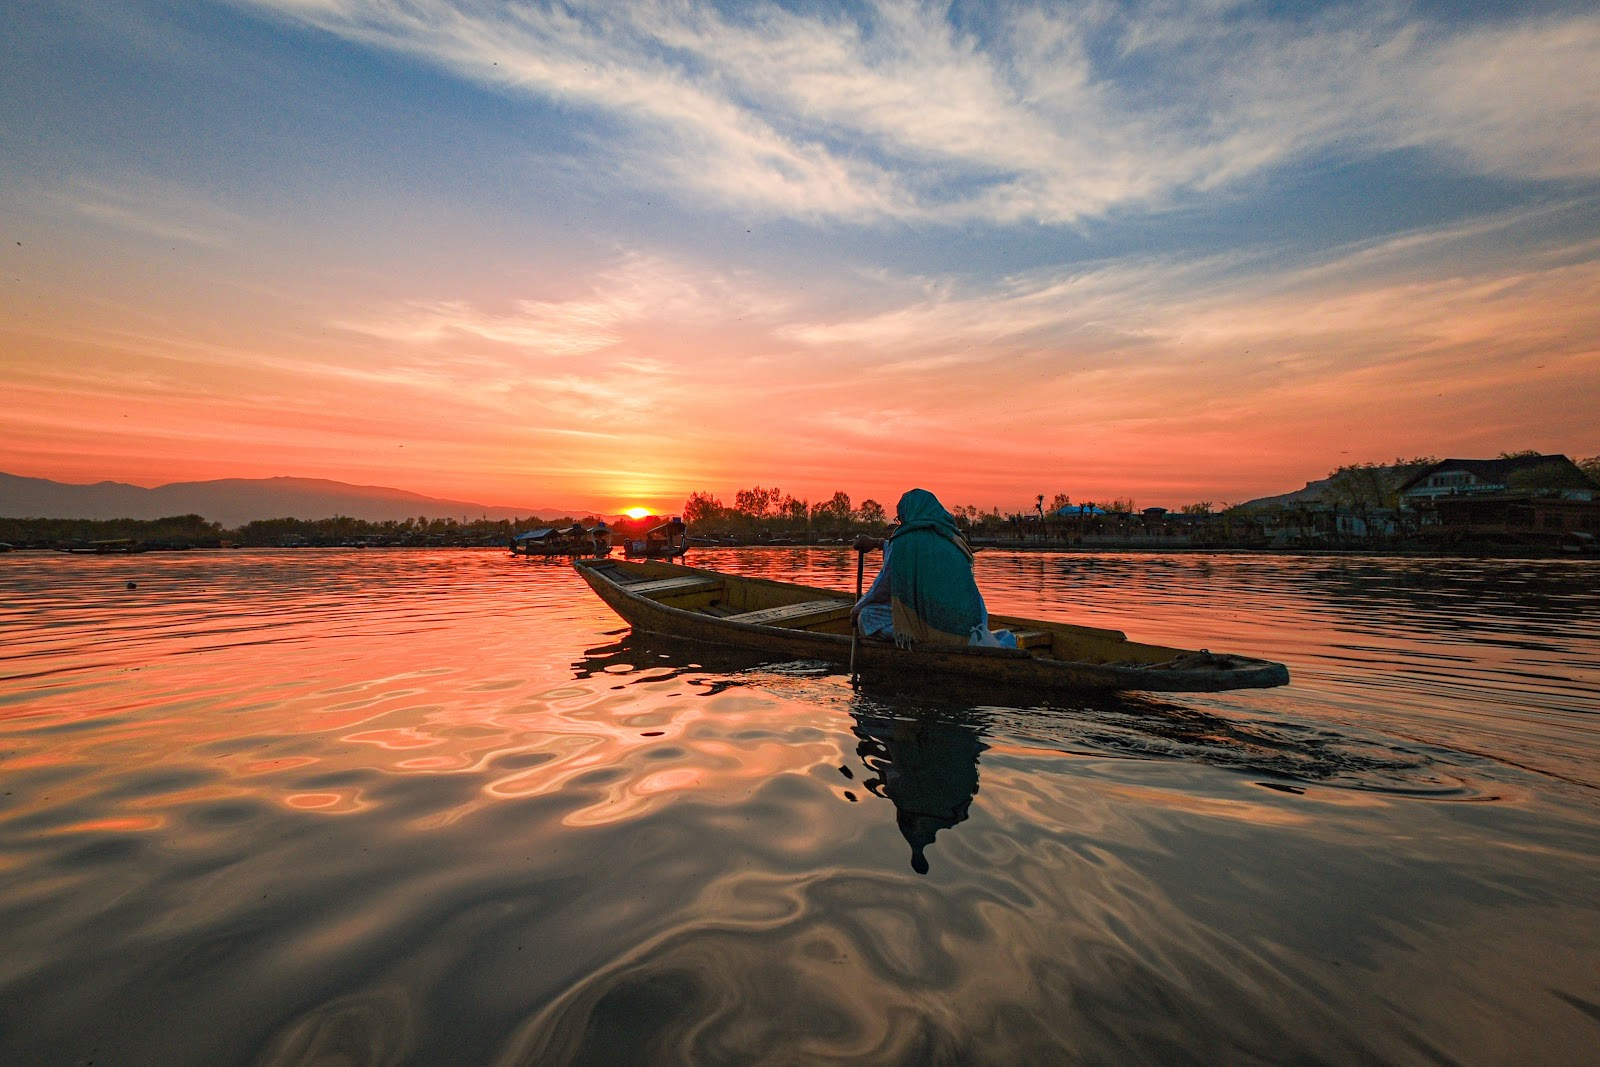 A sunset view of dal lake